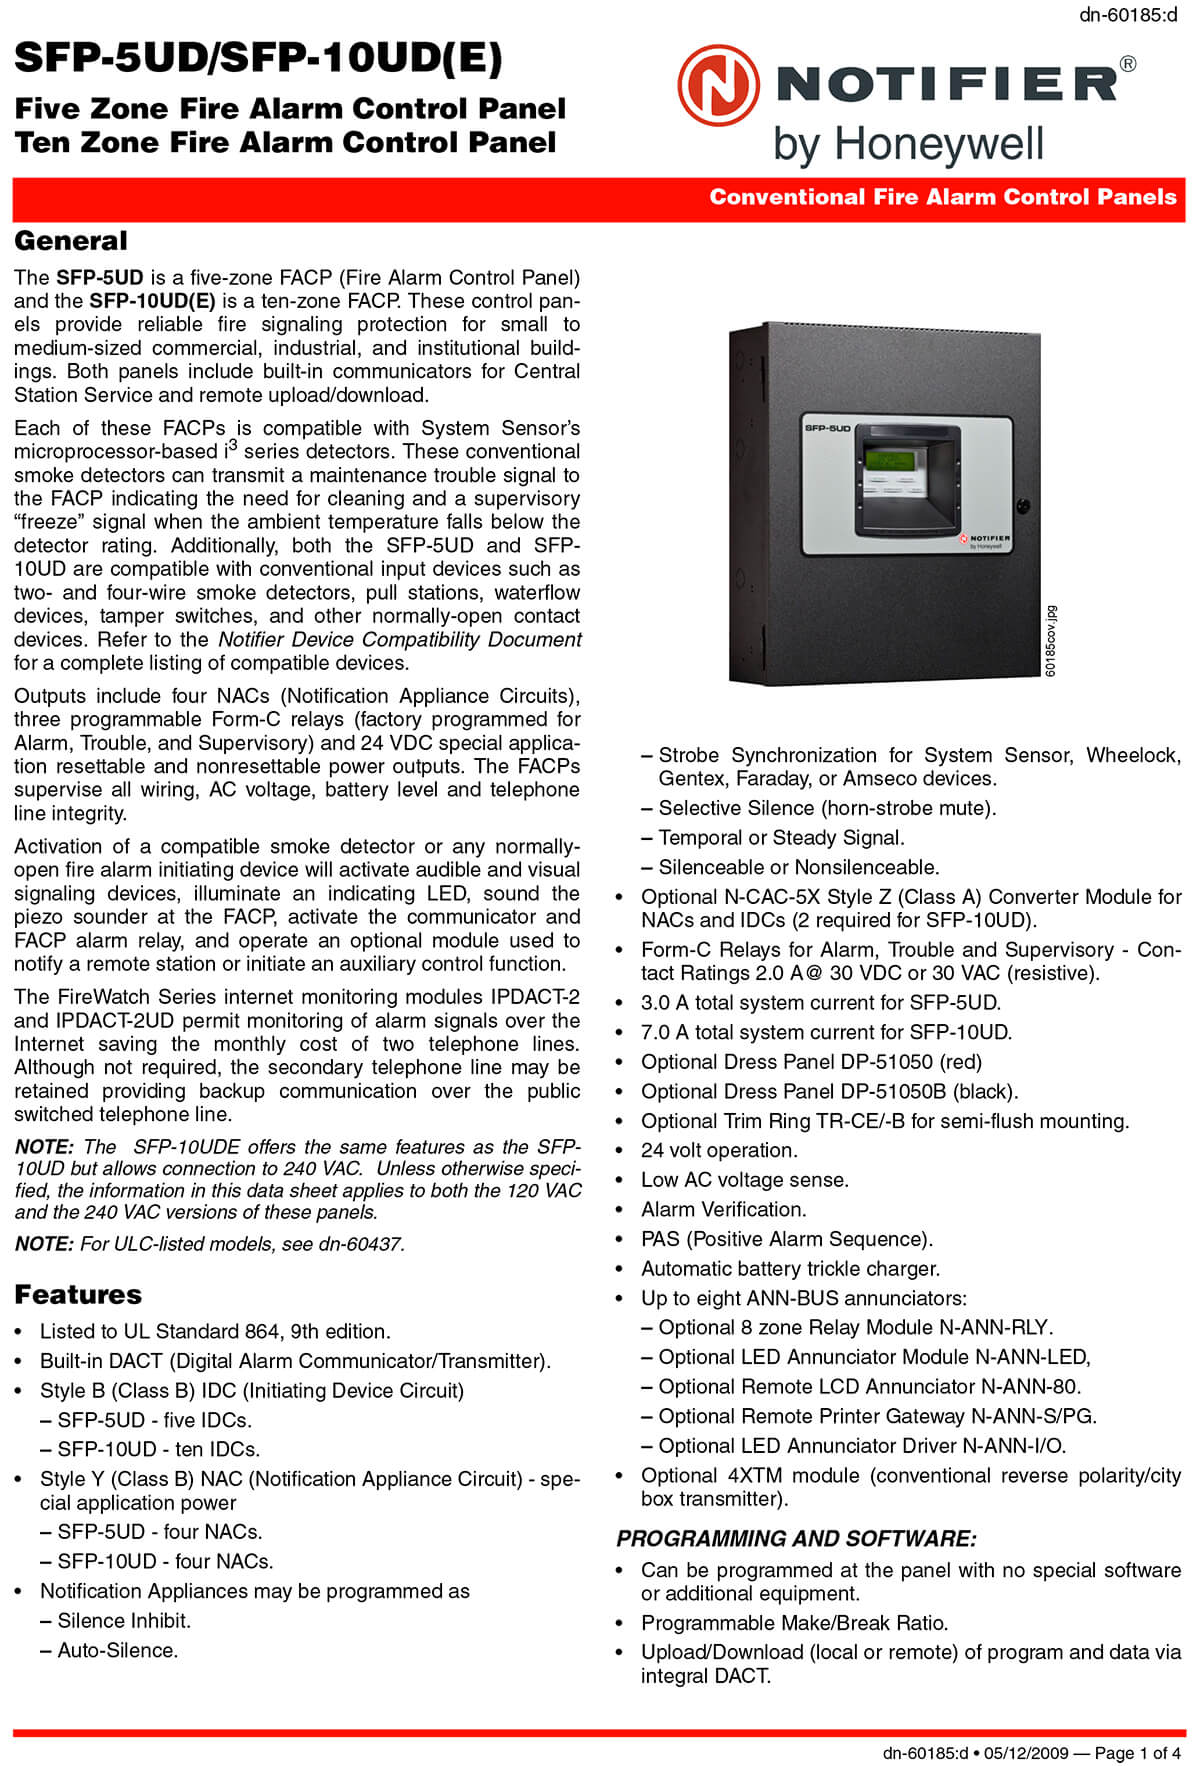 Ten Zone Fire Alarm Control Panel SFP-10UD (E)